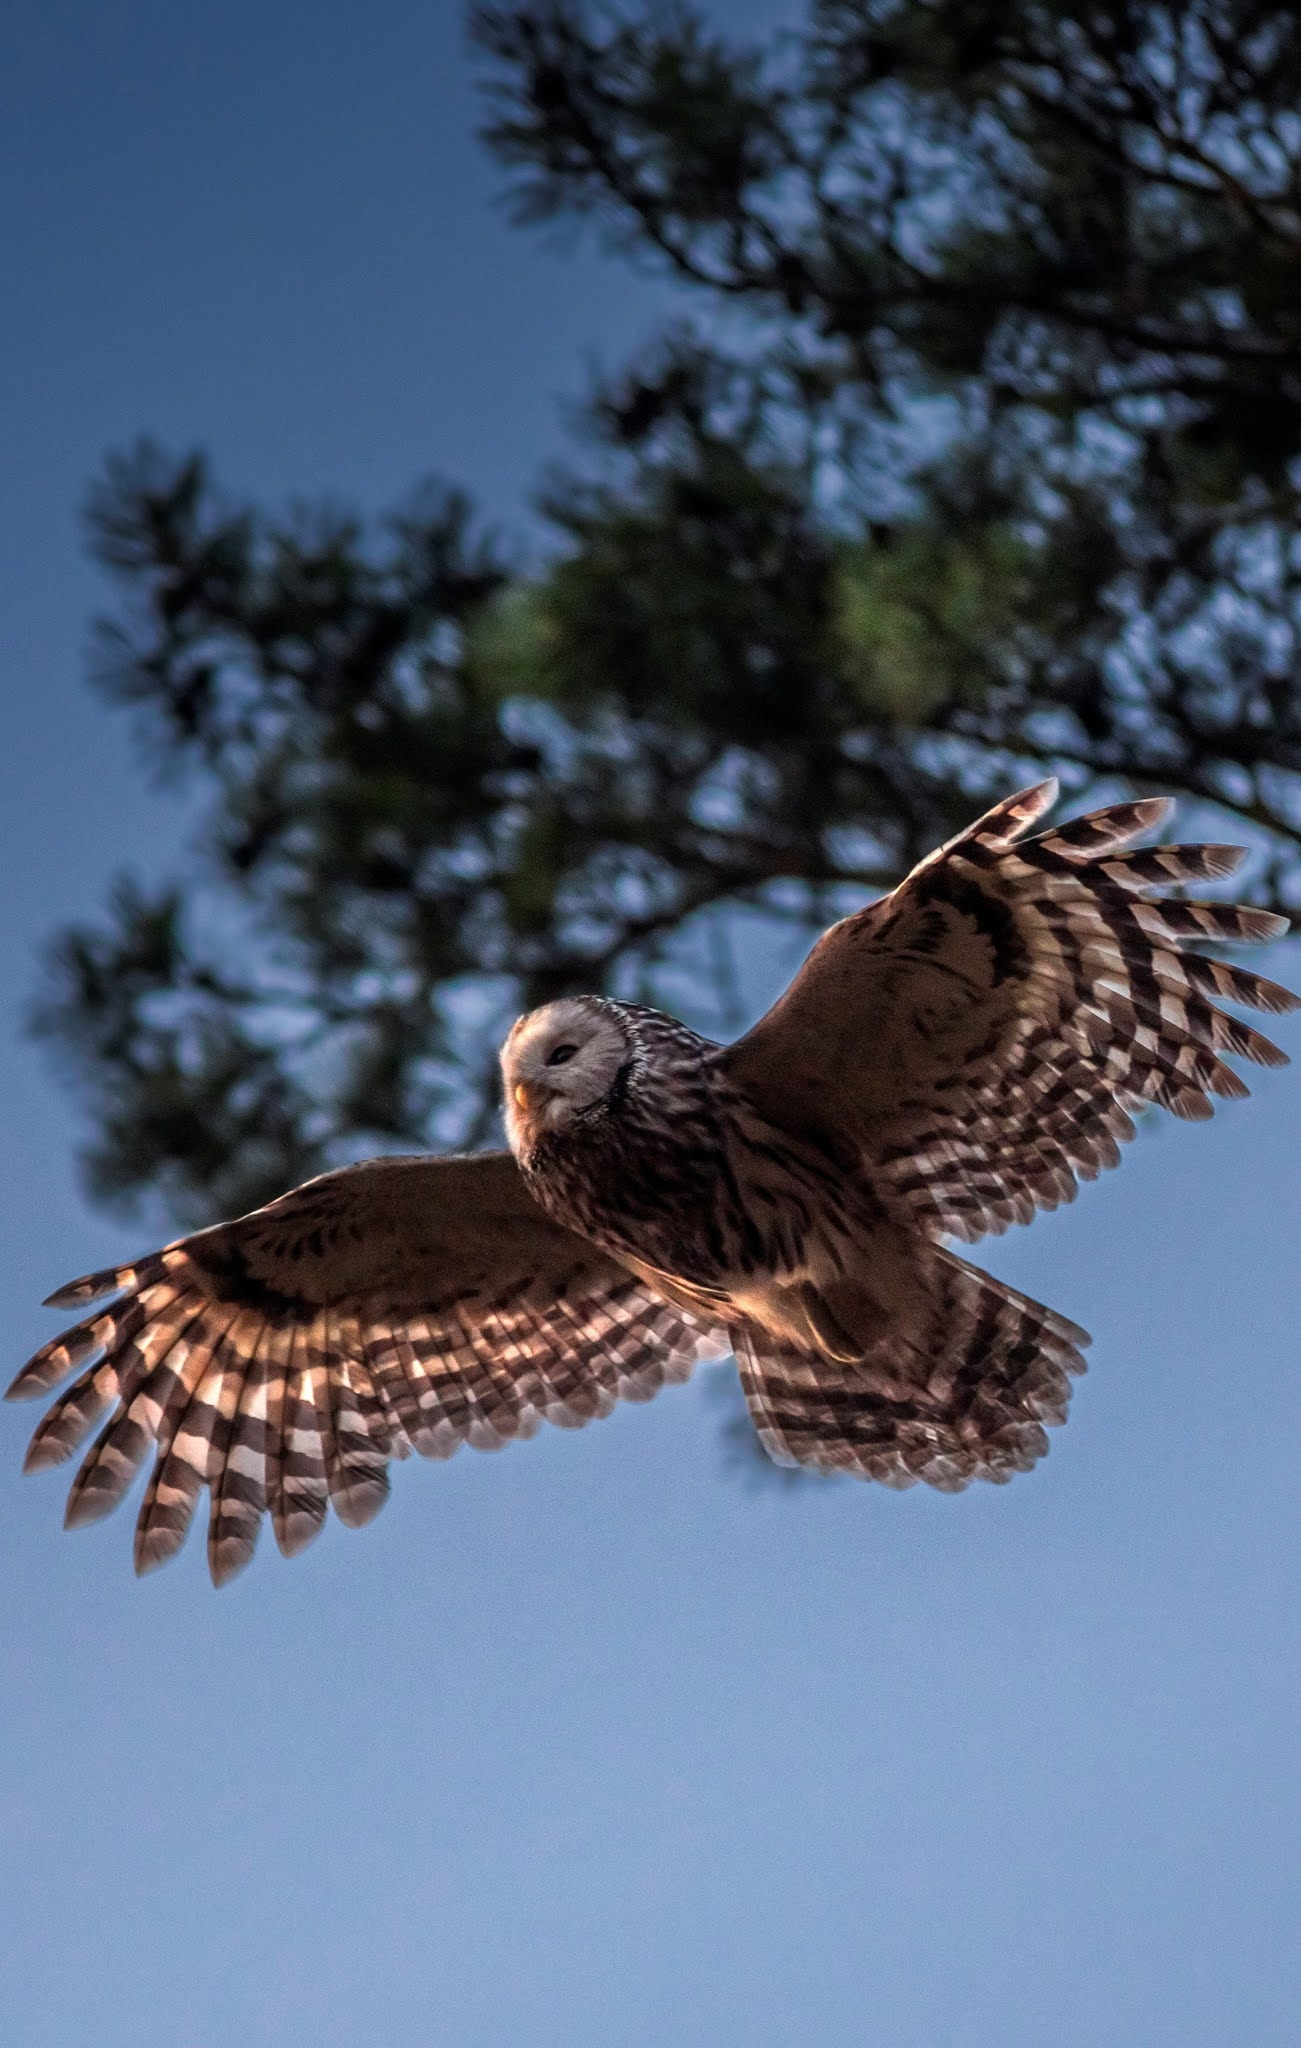 Ural owl in flight.